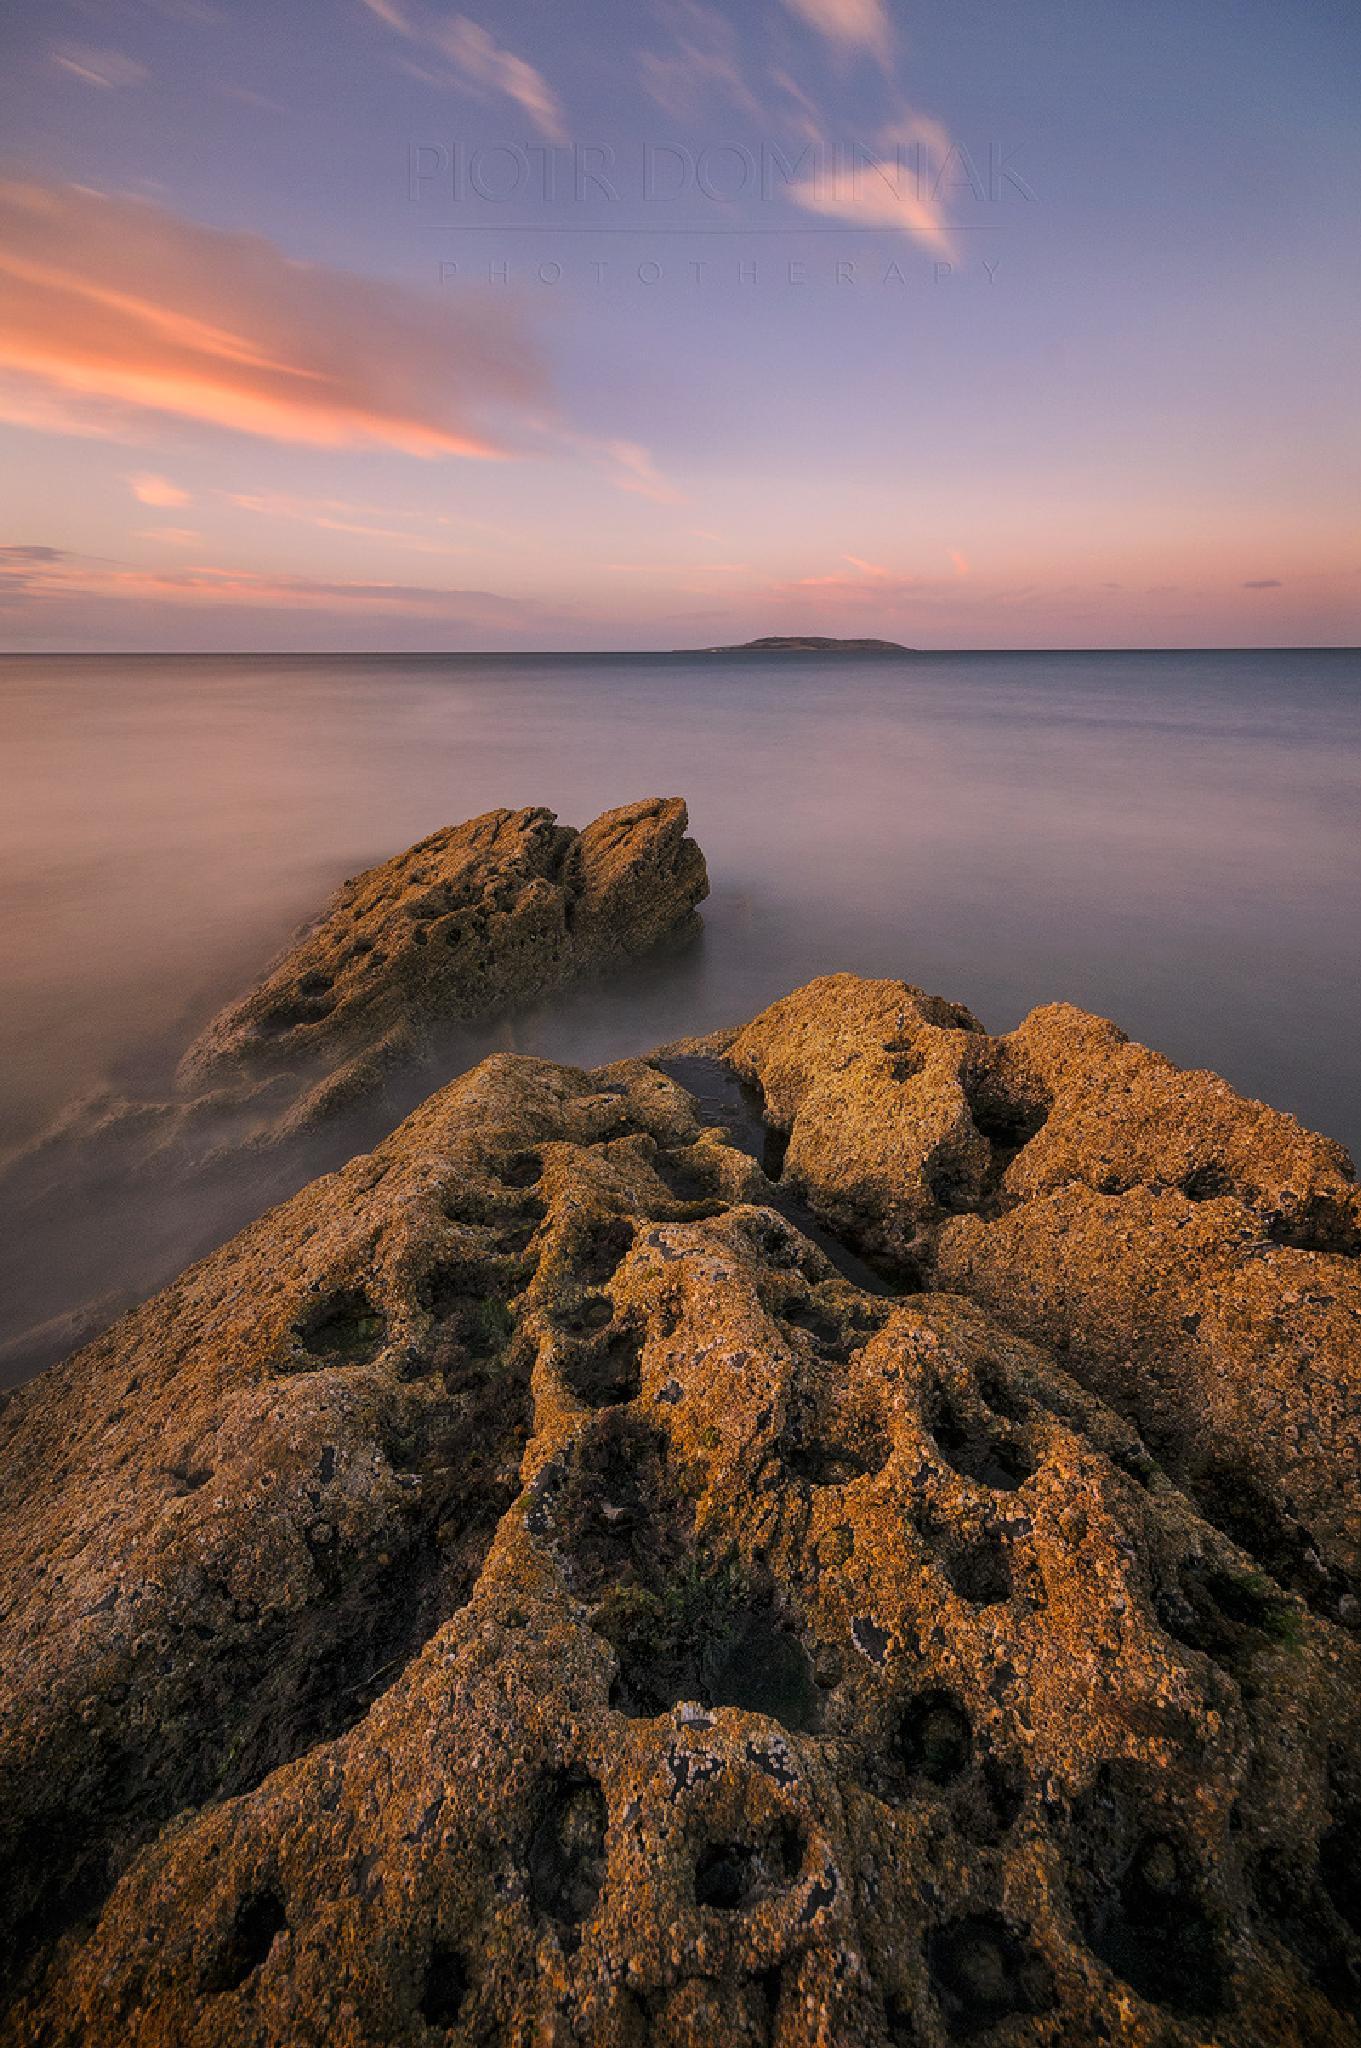 Orange ot the rocks. by Piotr Dominiak